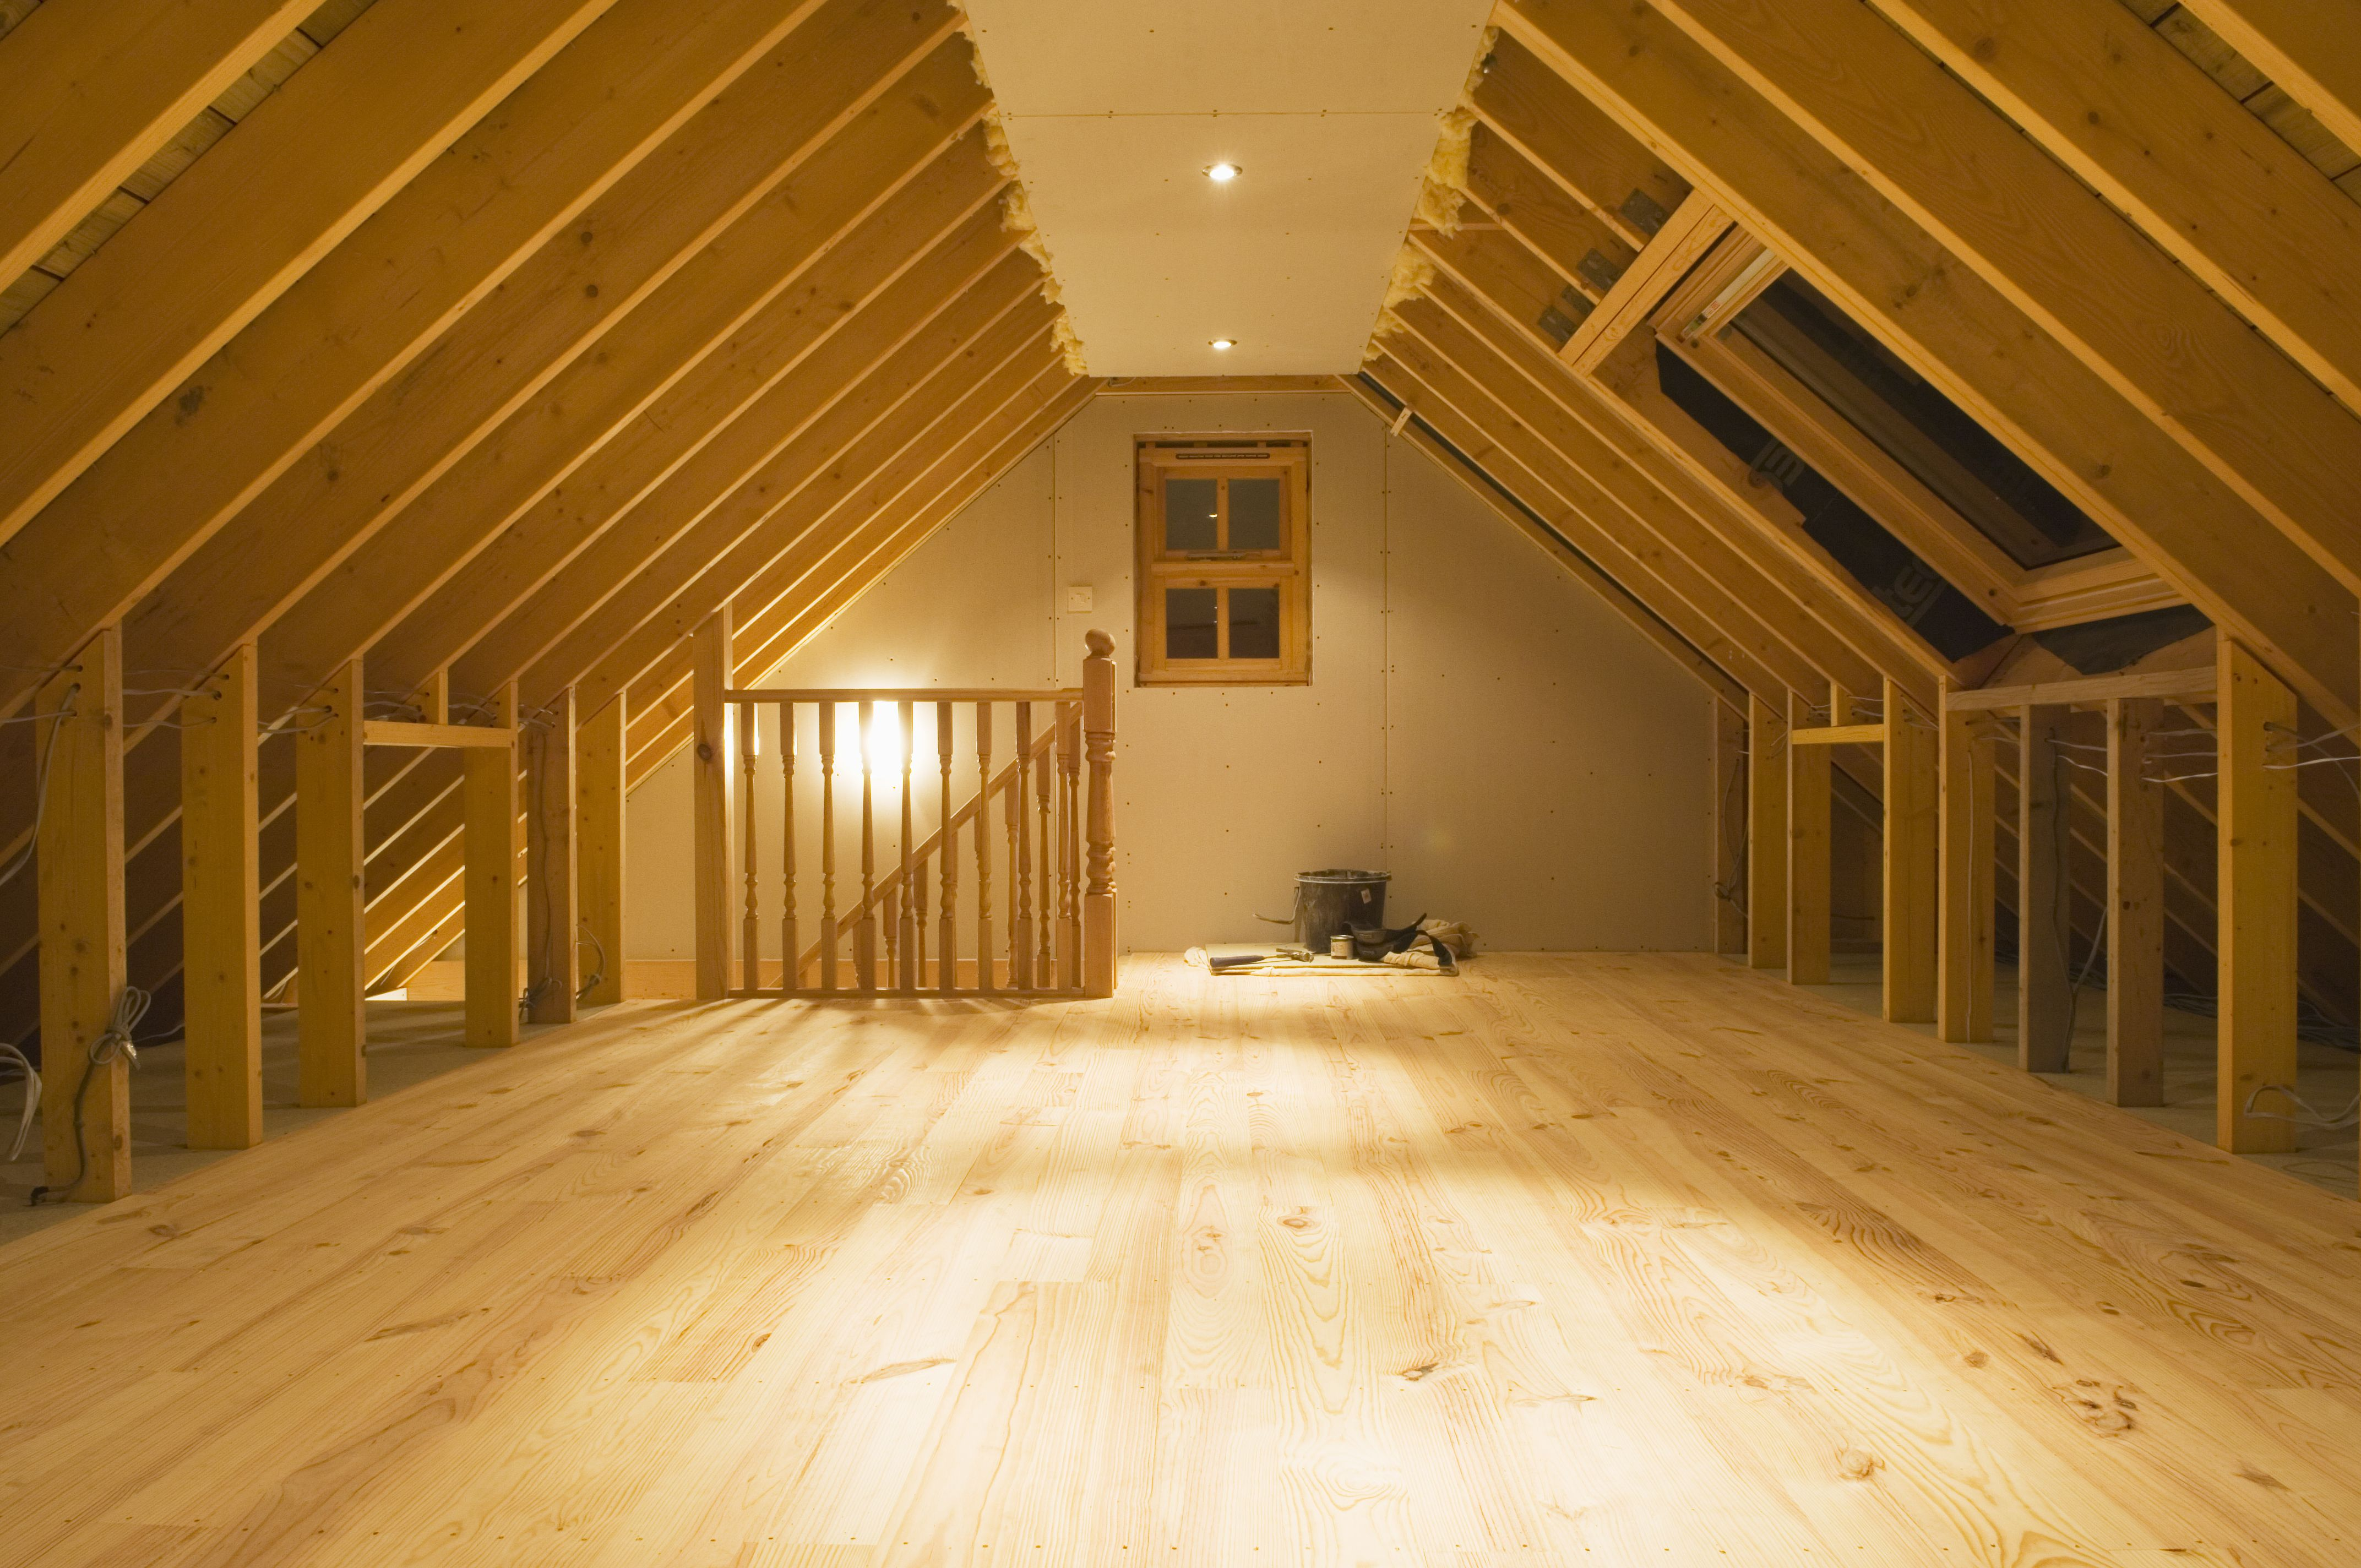 What Size Plywood For An Attic Floor Attic Flooring Attic Renovation Attic Apartment